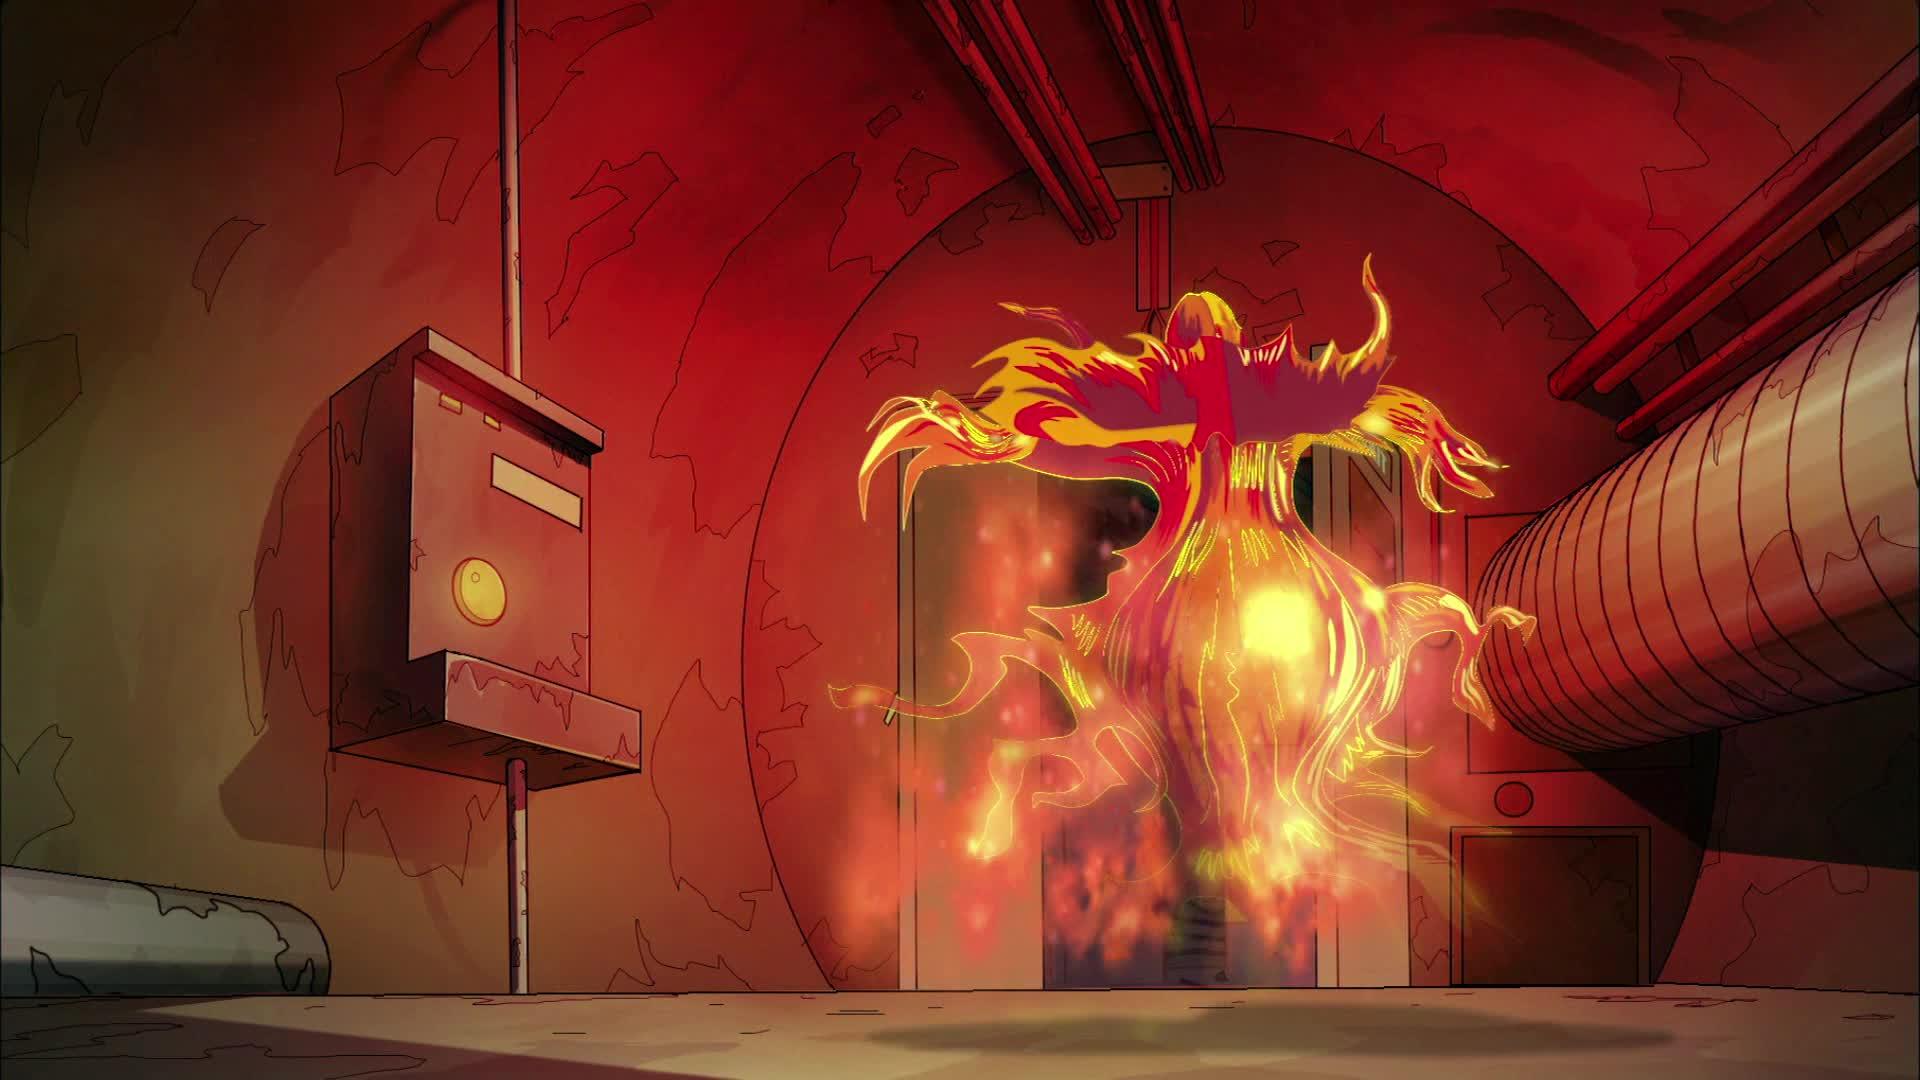 Вирус атакует Вирус атакует 3 серия Мощь Диомера